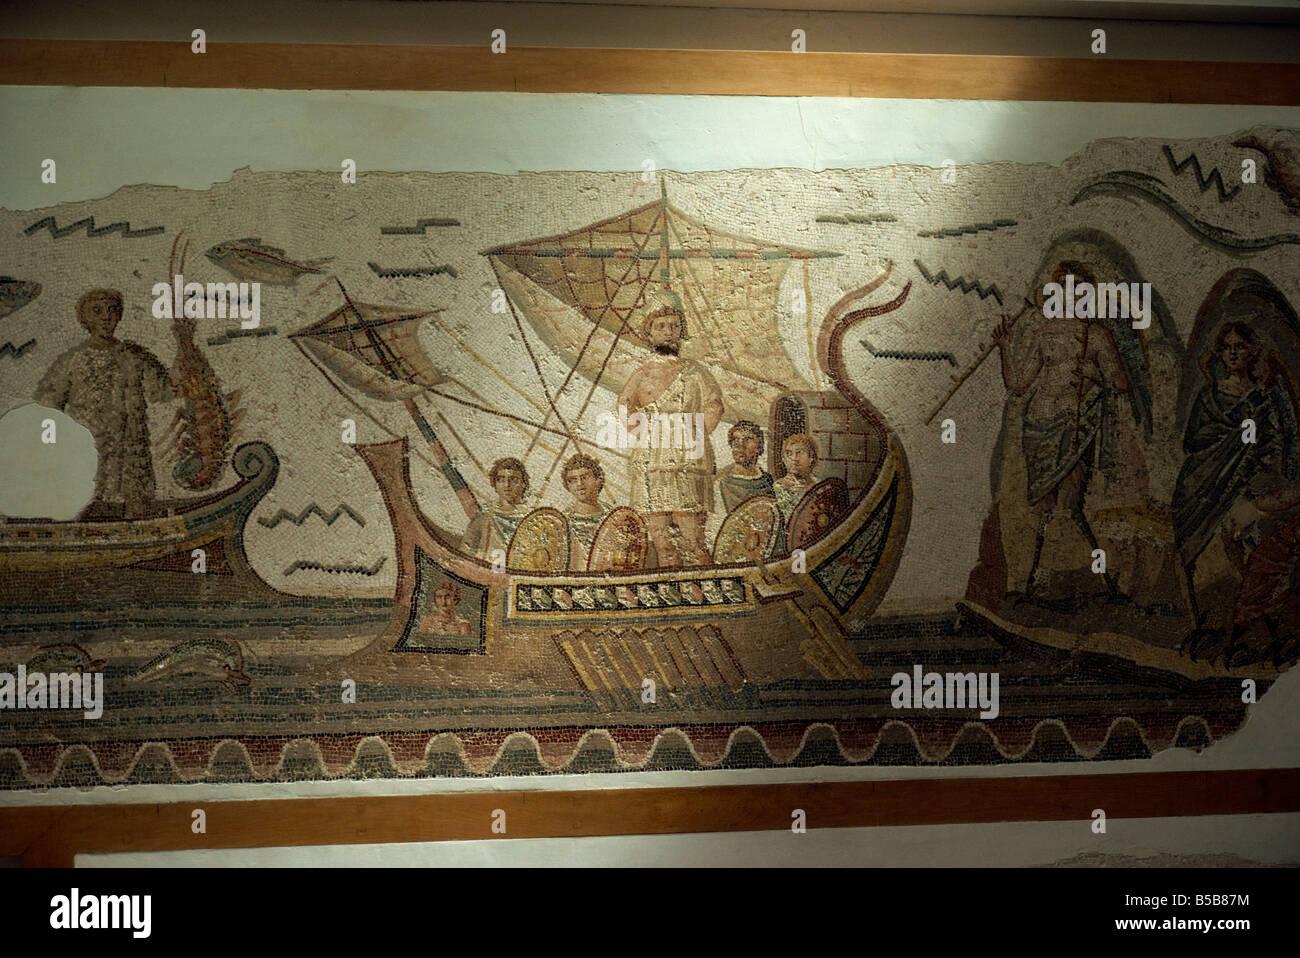 Mosaics at Bardo Museum Tunis Tunisia North Africa Africa Stock Photo